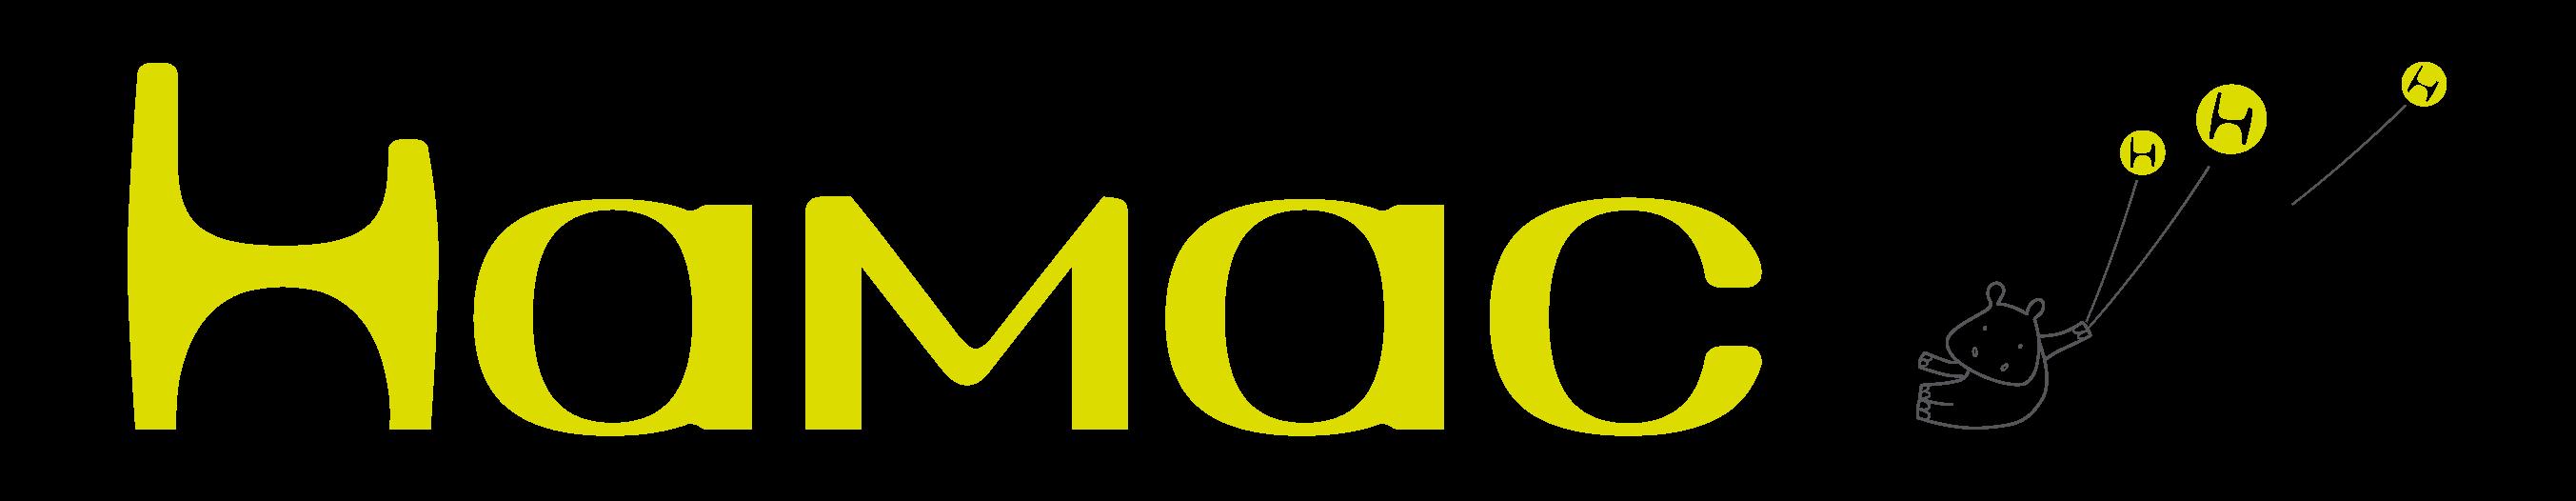 marque-couche-hamac